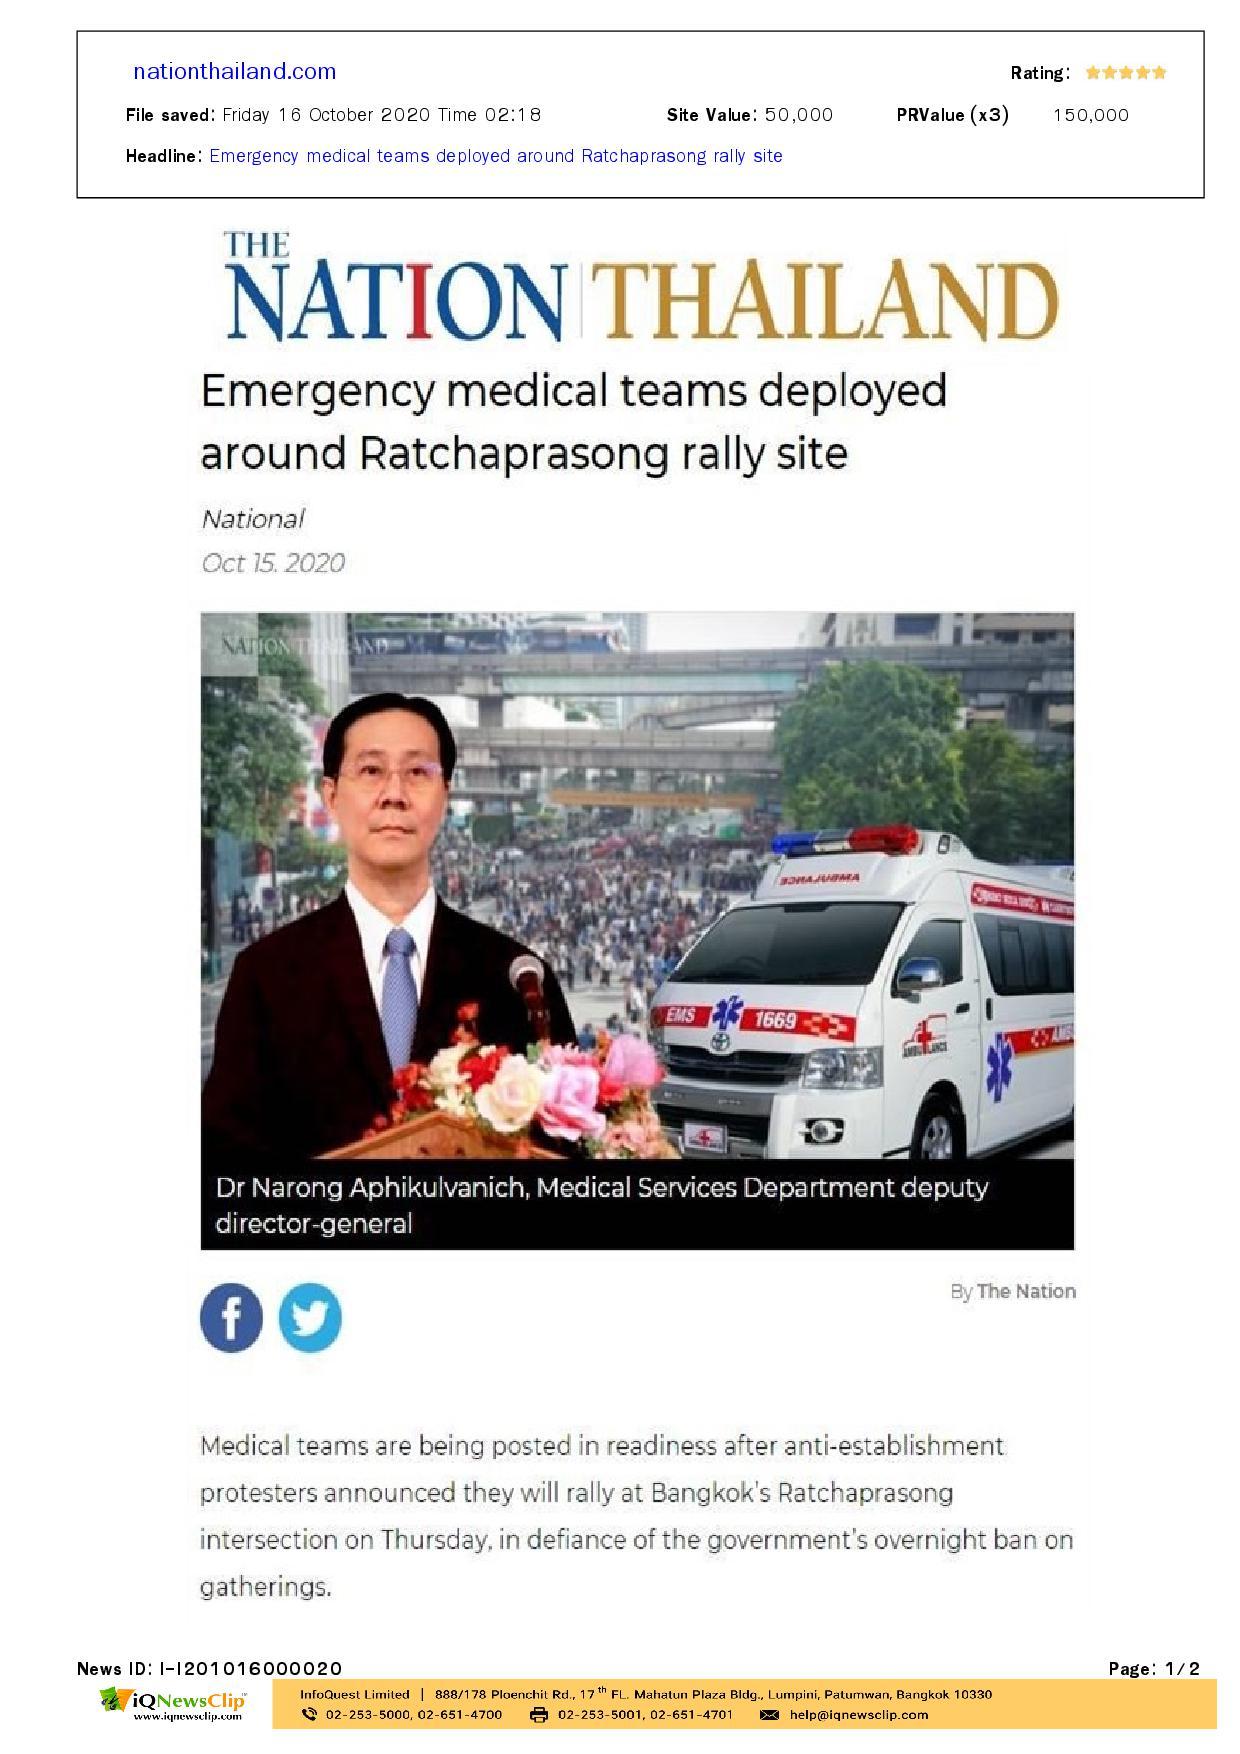 Emergency medical teams deployed around Ratchaprasong rally site